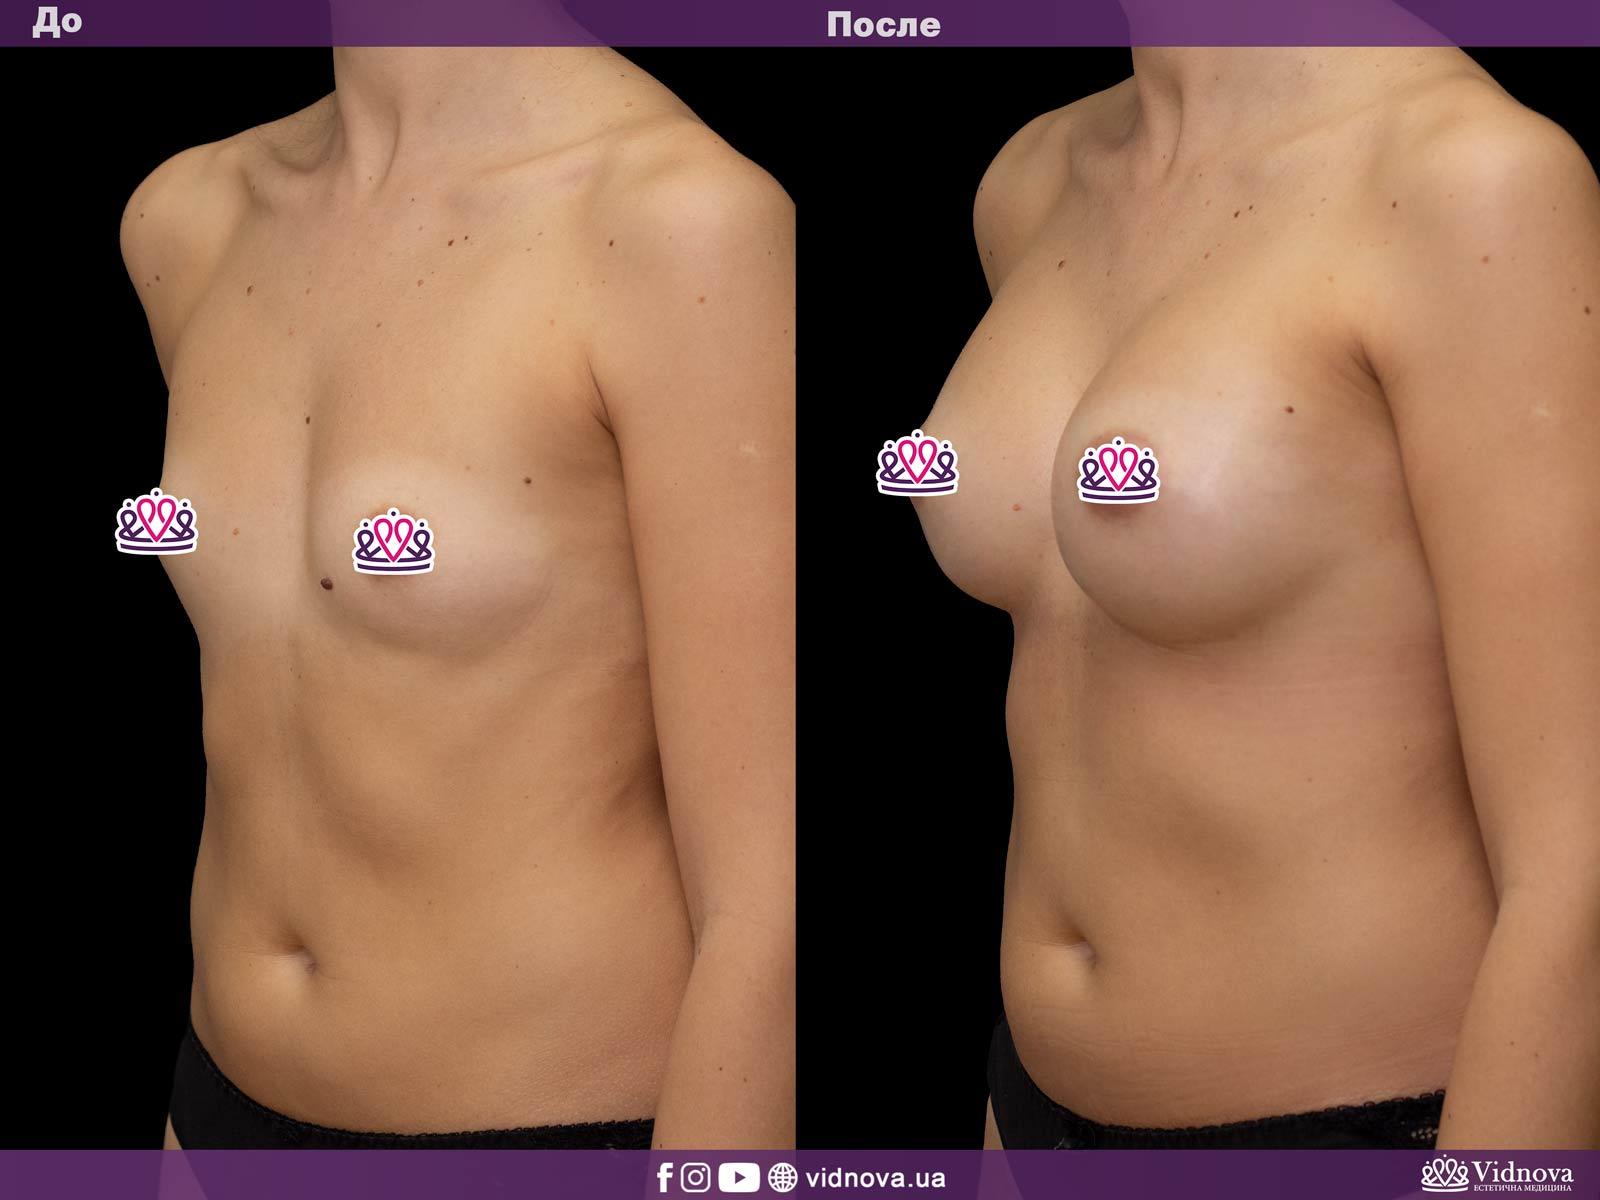 Увеличение груди: Фото ДО и ПОСЛЕ - Пример №27-2 - Клиника Vidnova